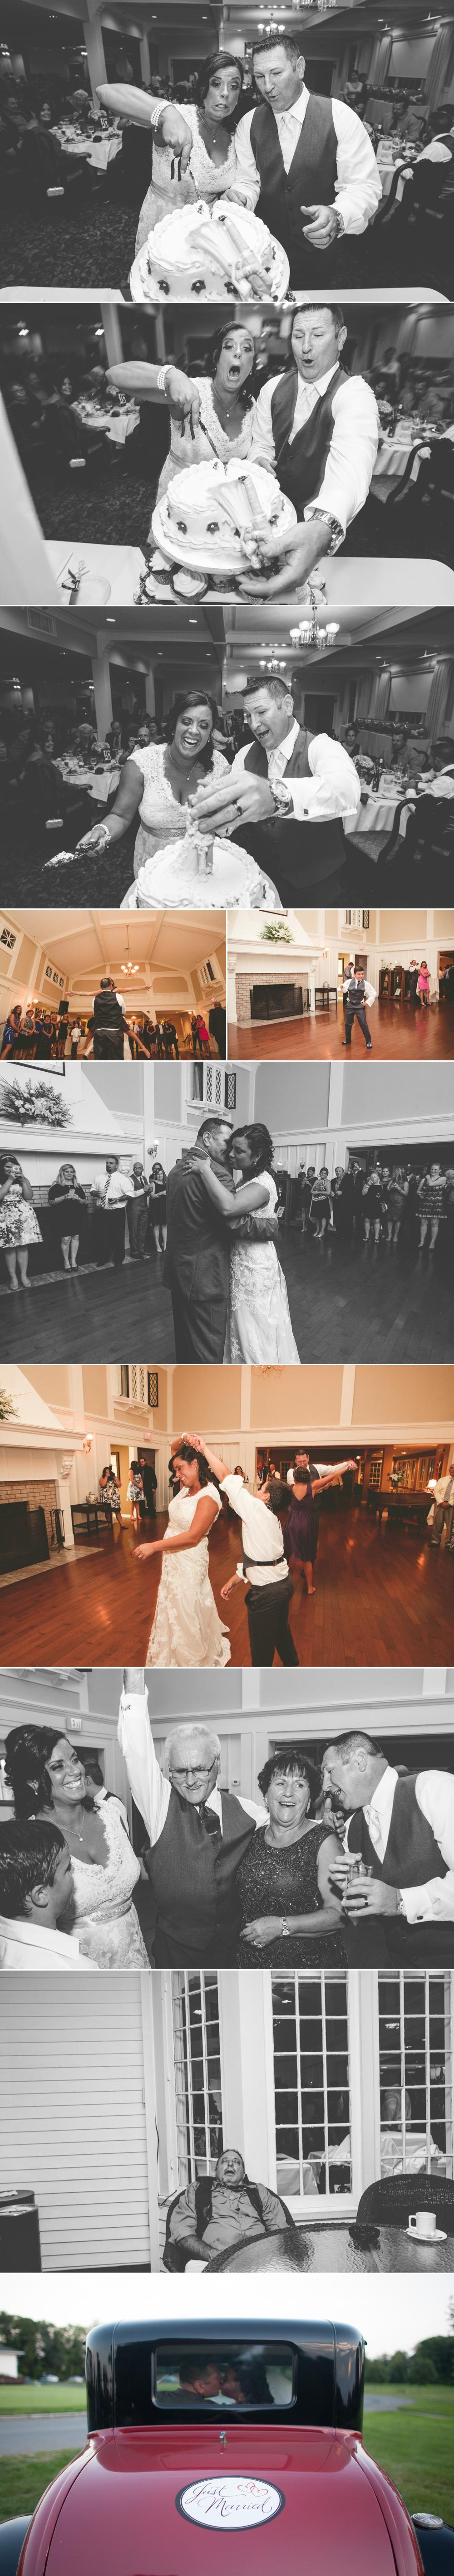 jason_domingues_photography_best_photographer_kansas_city_kc_wedding_engagement_rhode_island_massachusetts_destination_creative_documentary_portraits_experienced_weddings_4